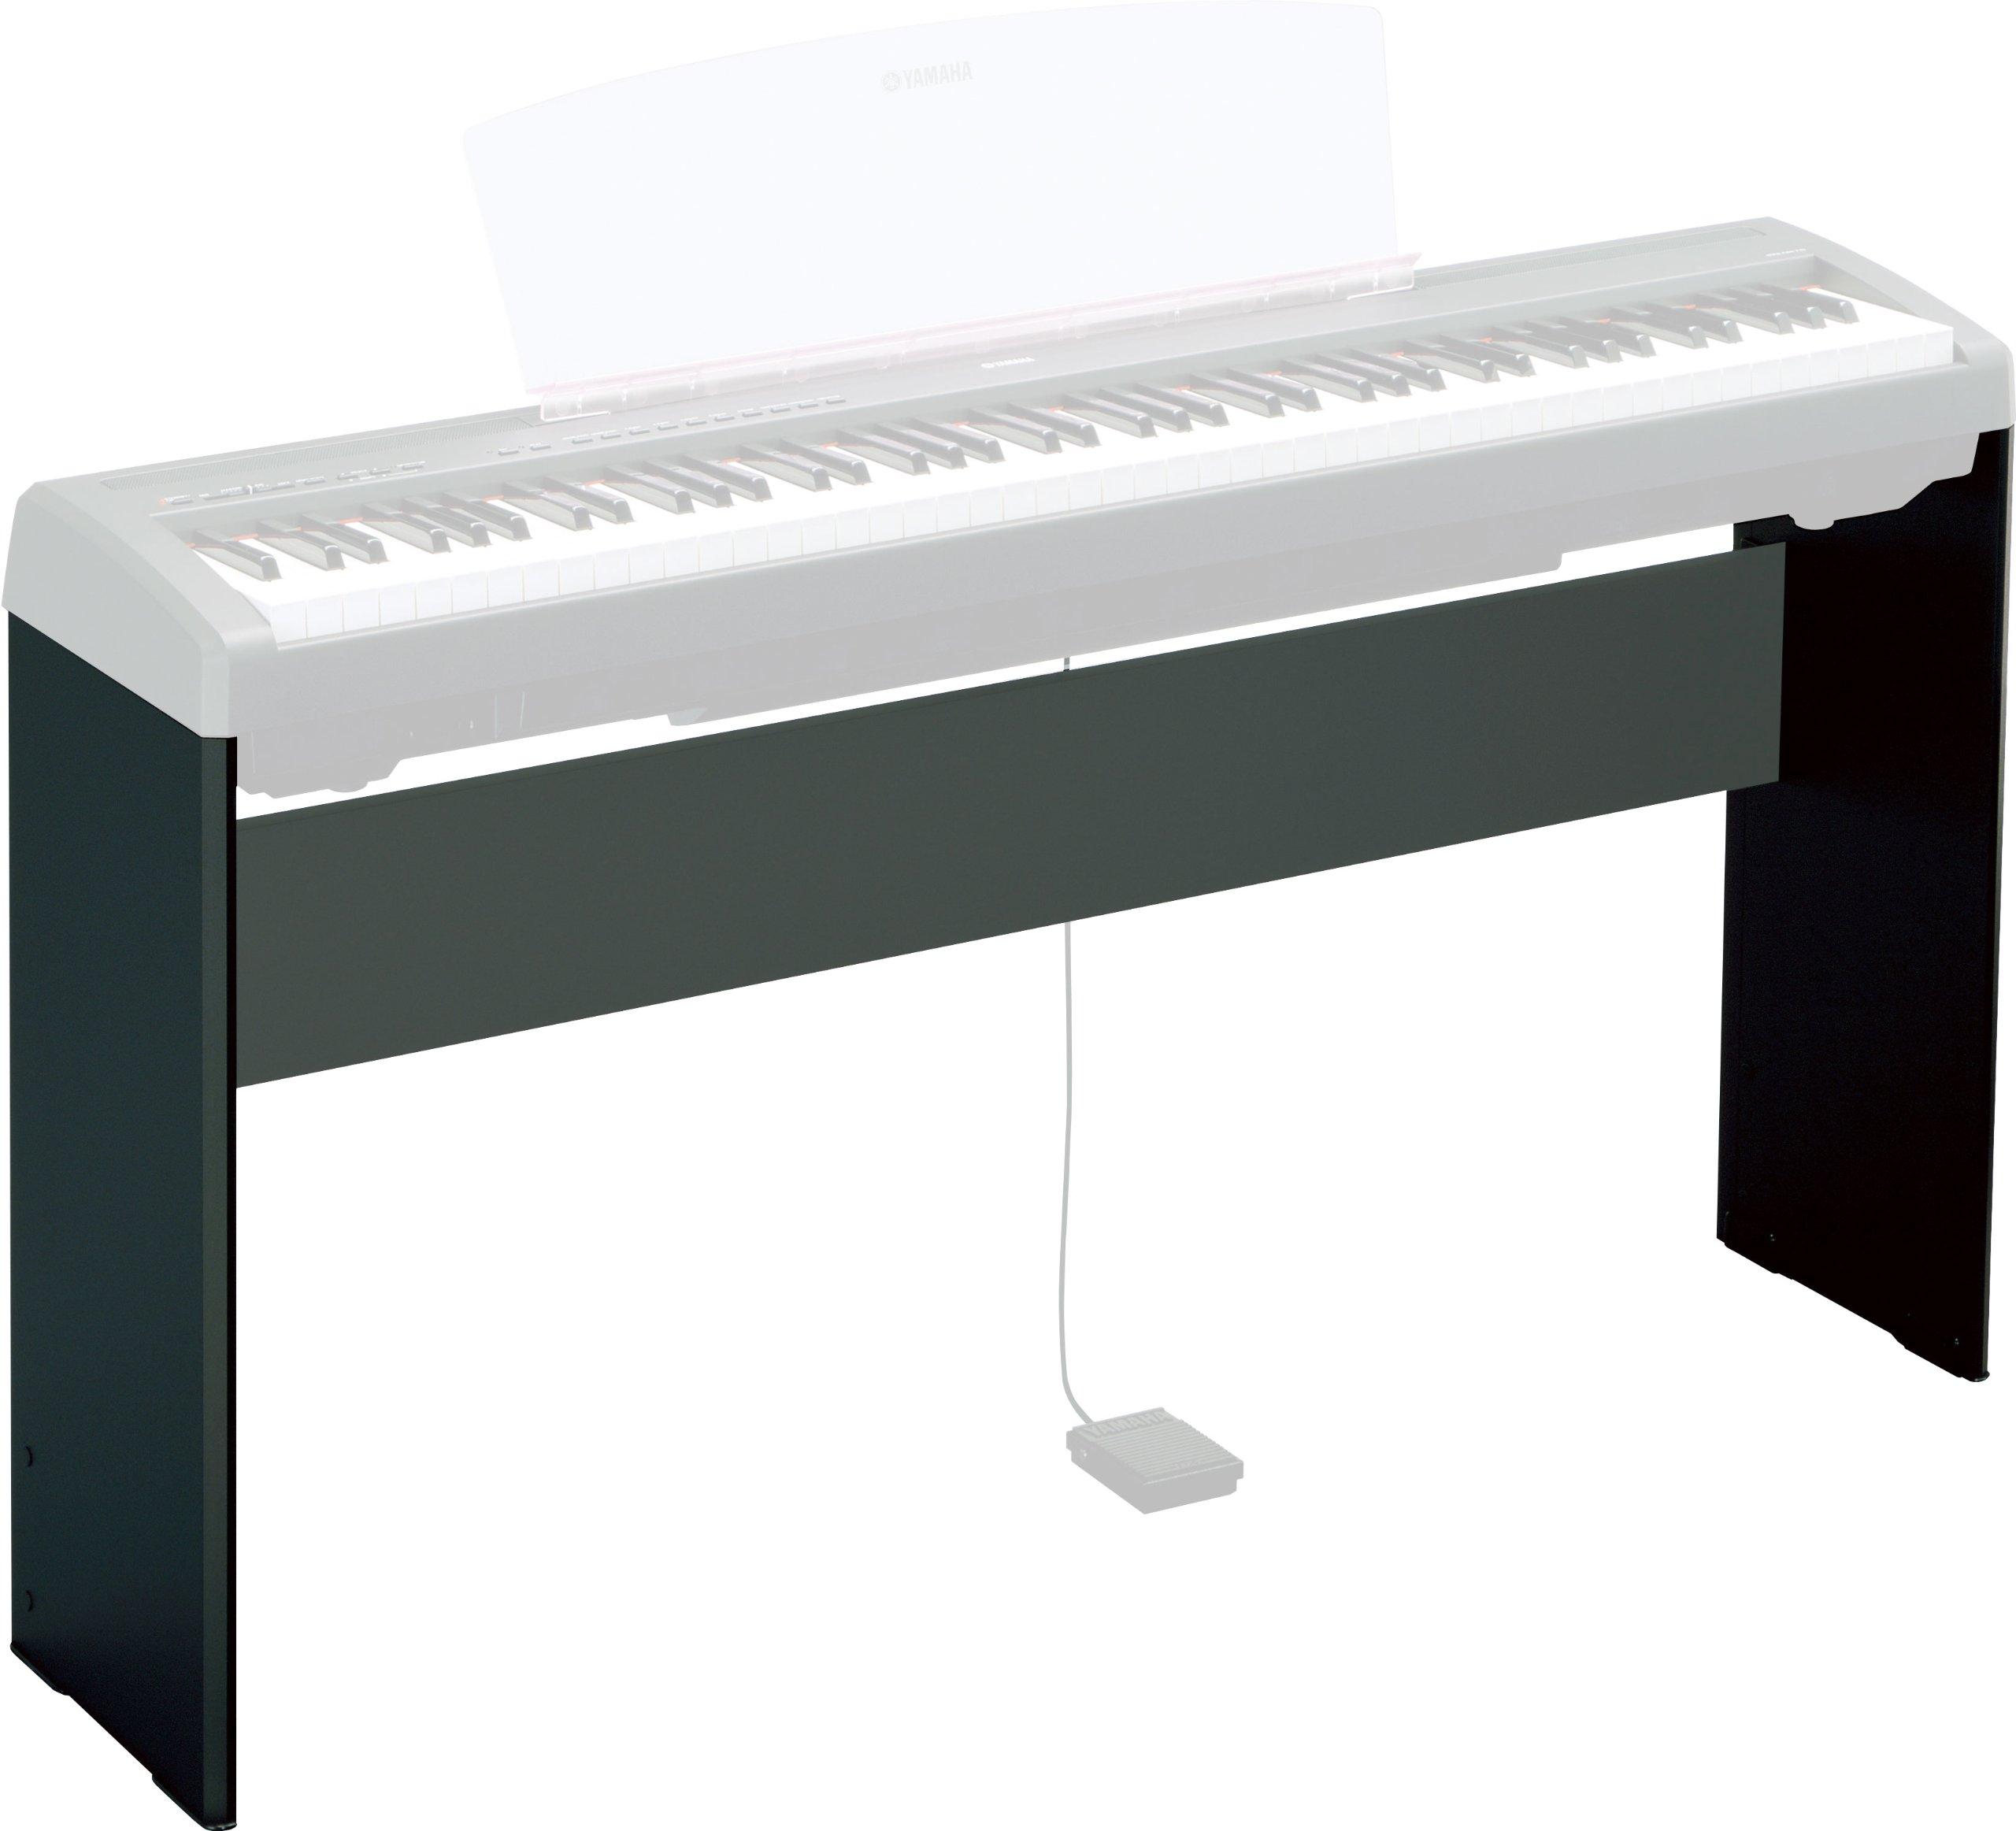 Yamaha L85 Keyboard Stand for P95 - Wood - Black [Electronics]